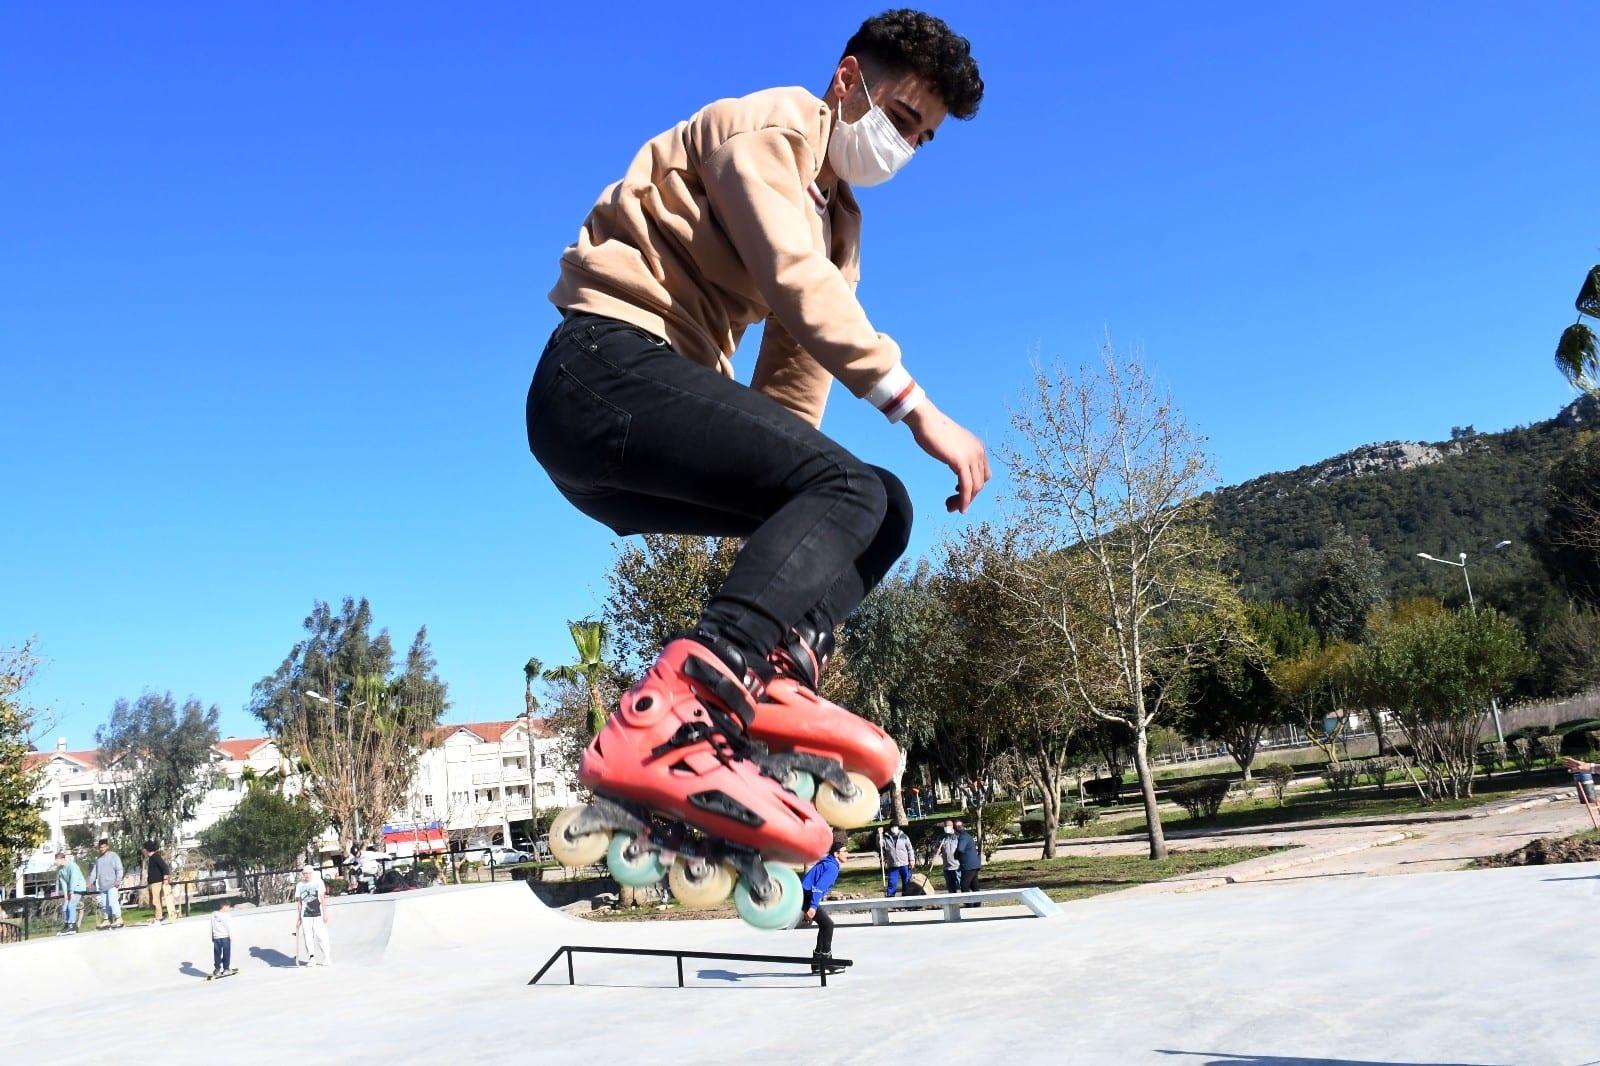 skate parka genclerden yogun ilgi 0 Pa6BNf5y